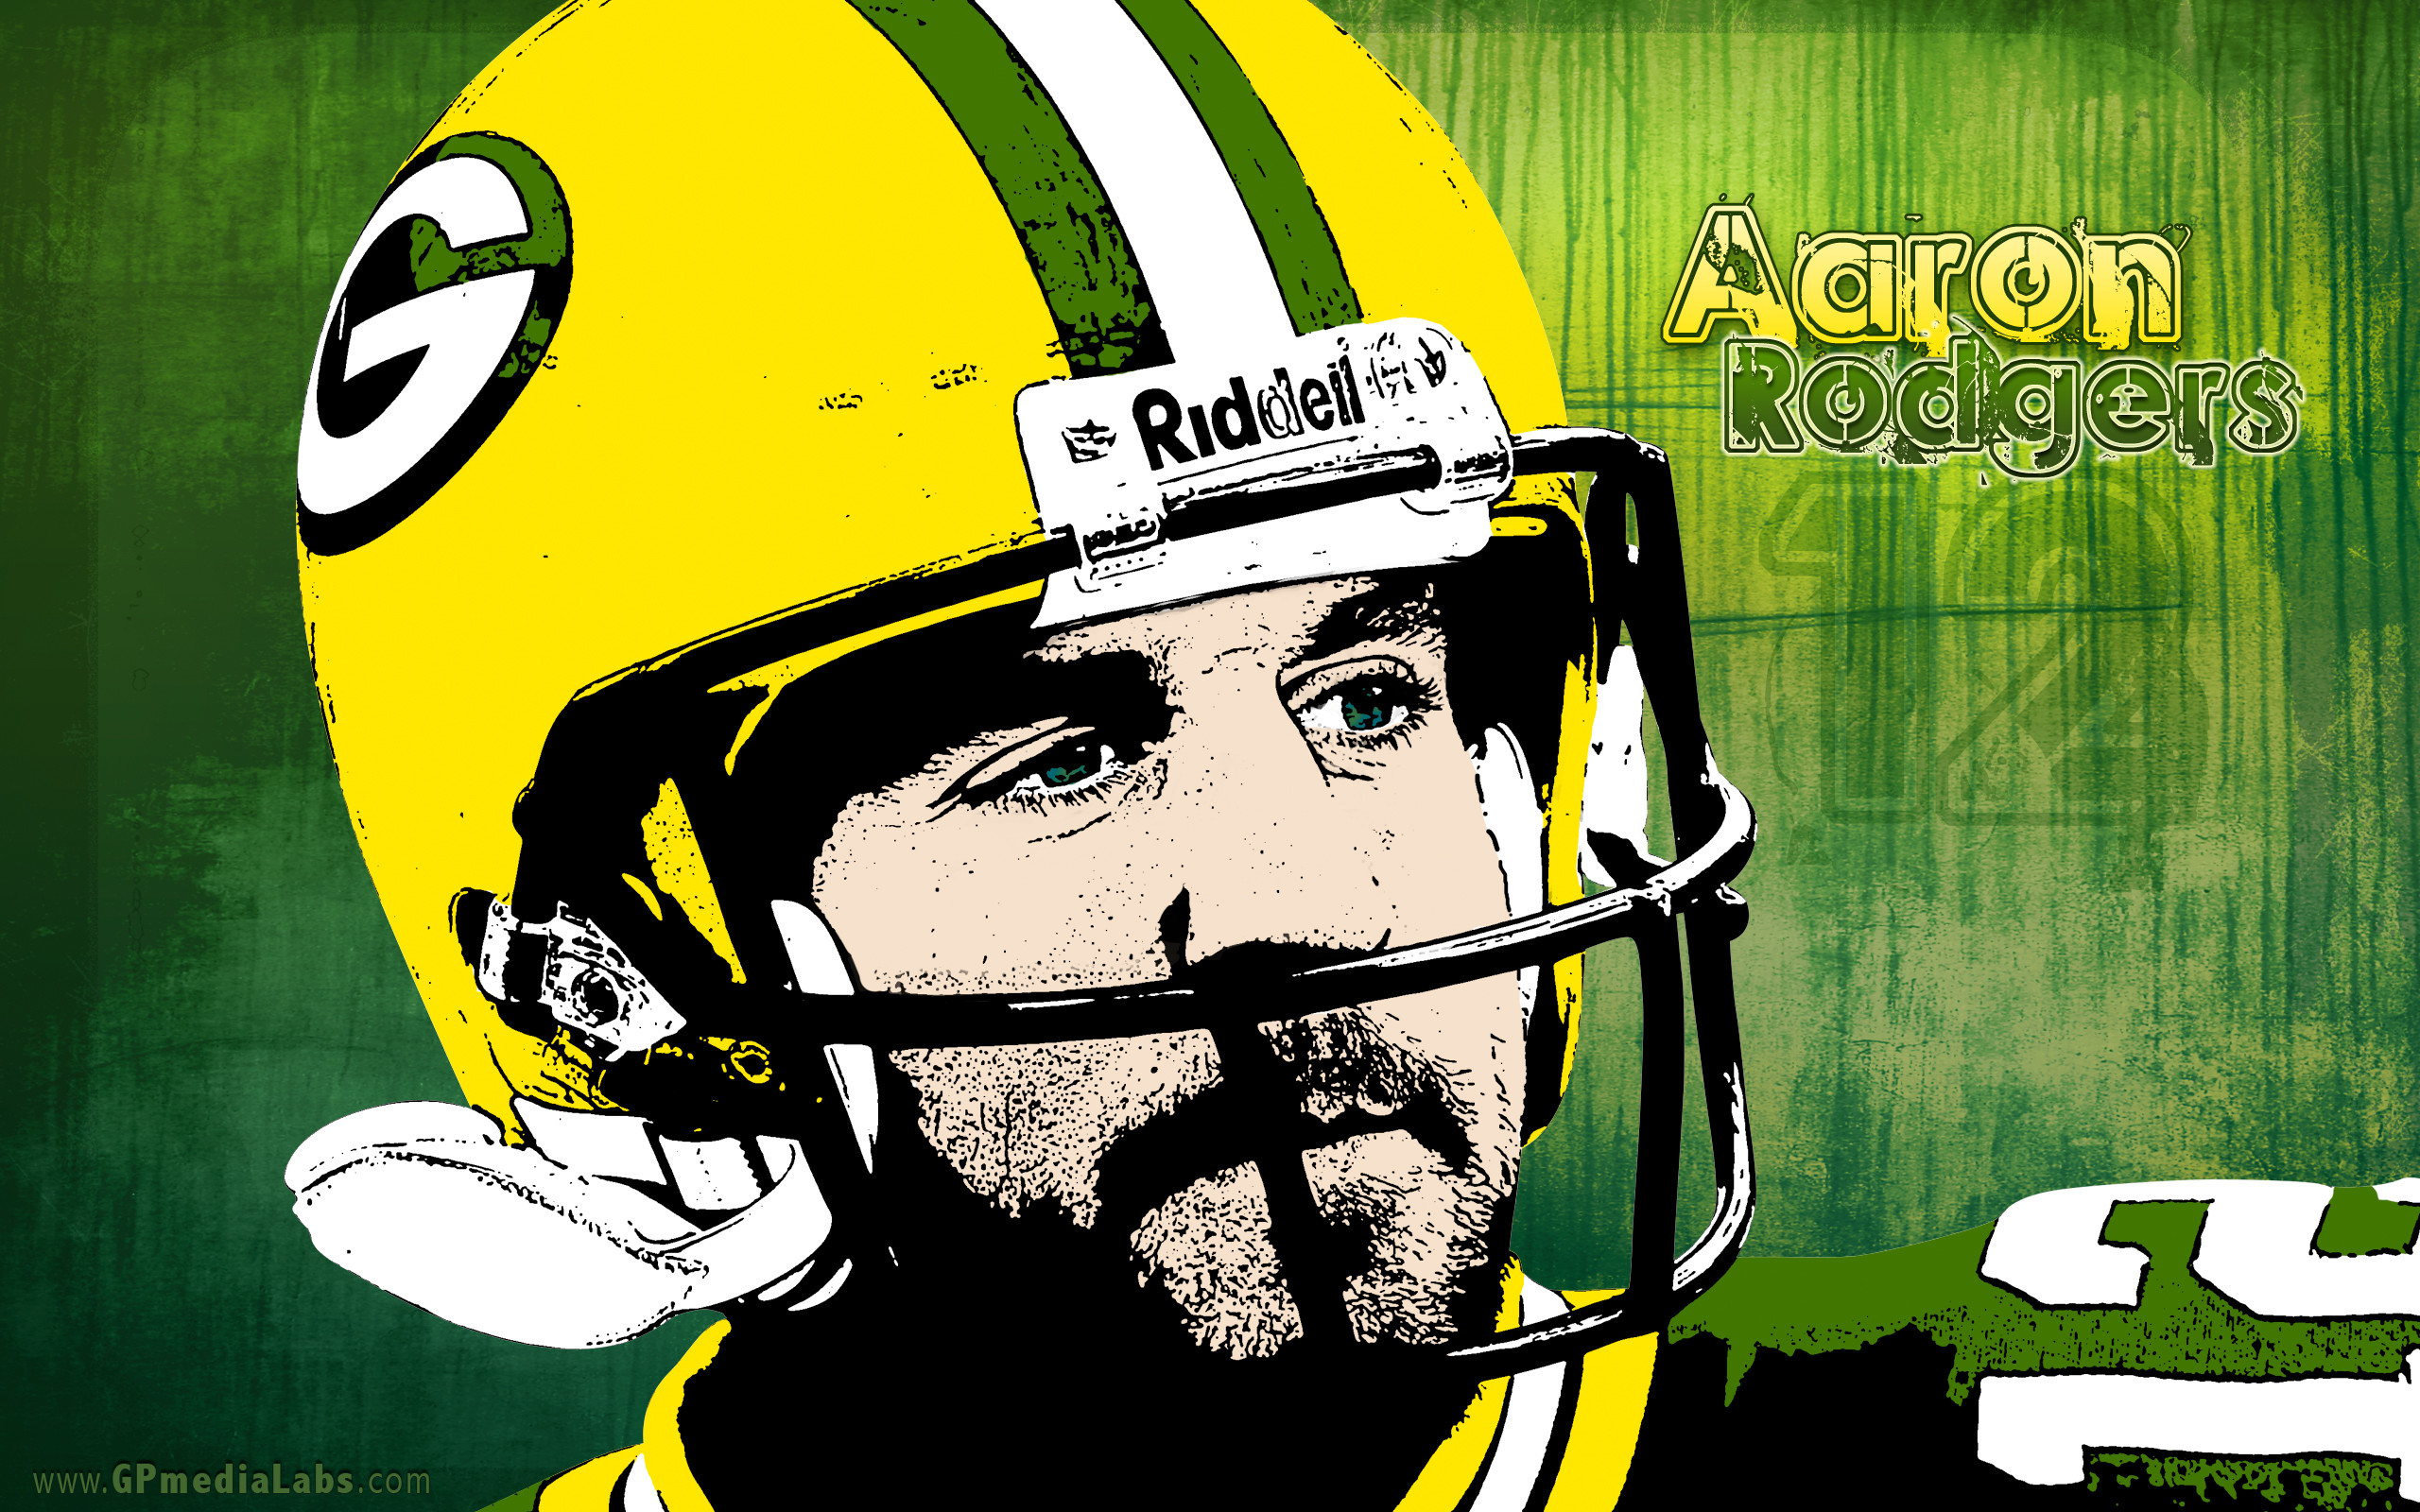 Green Bay Packers Wallpaper – Aaron Rodgers #12